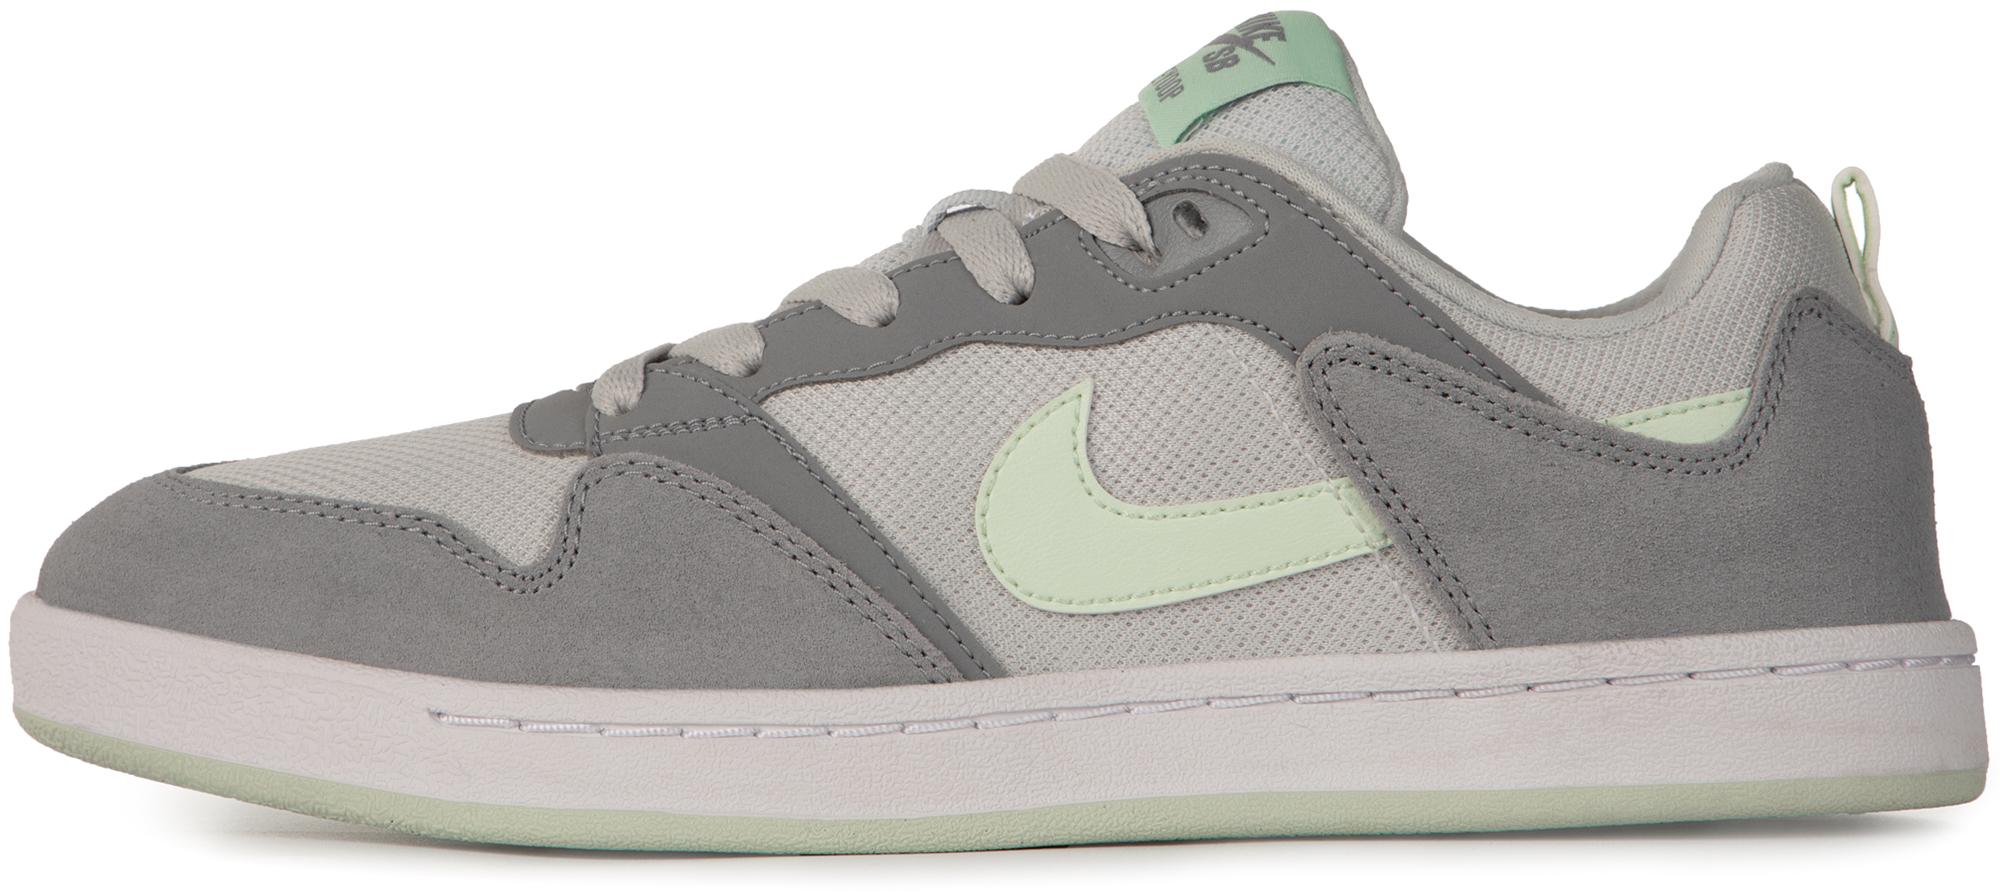 цена на Nike Кеды женские Nike Sb Alleyoop, размер 39.5